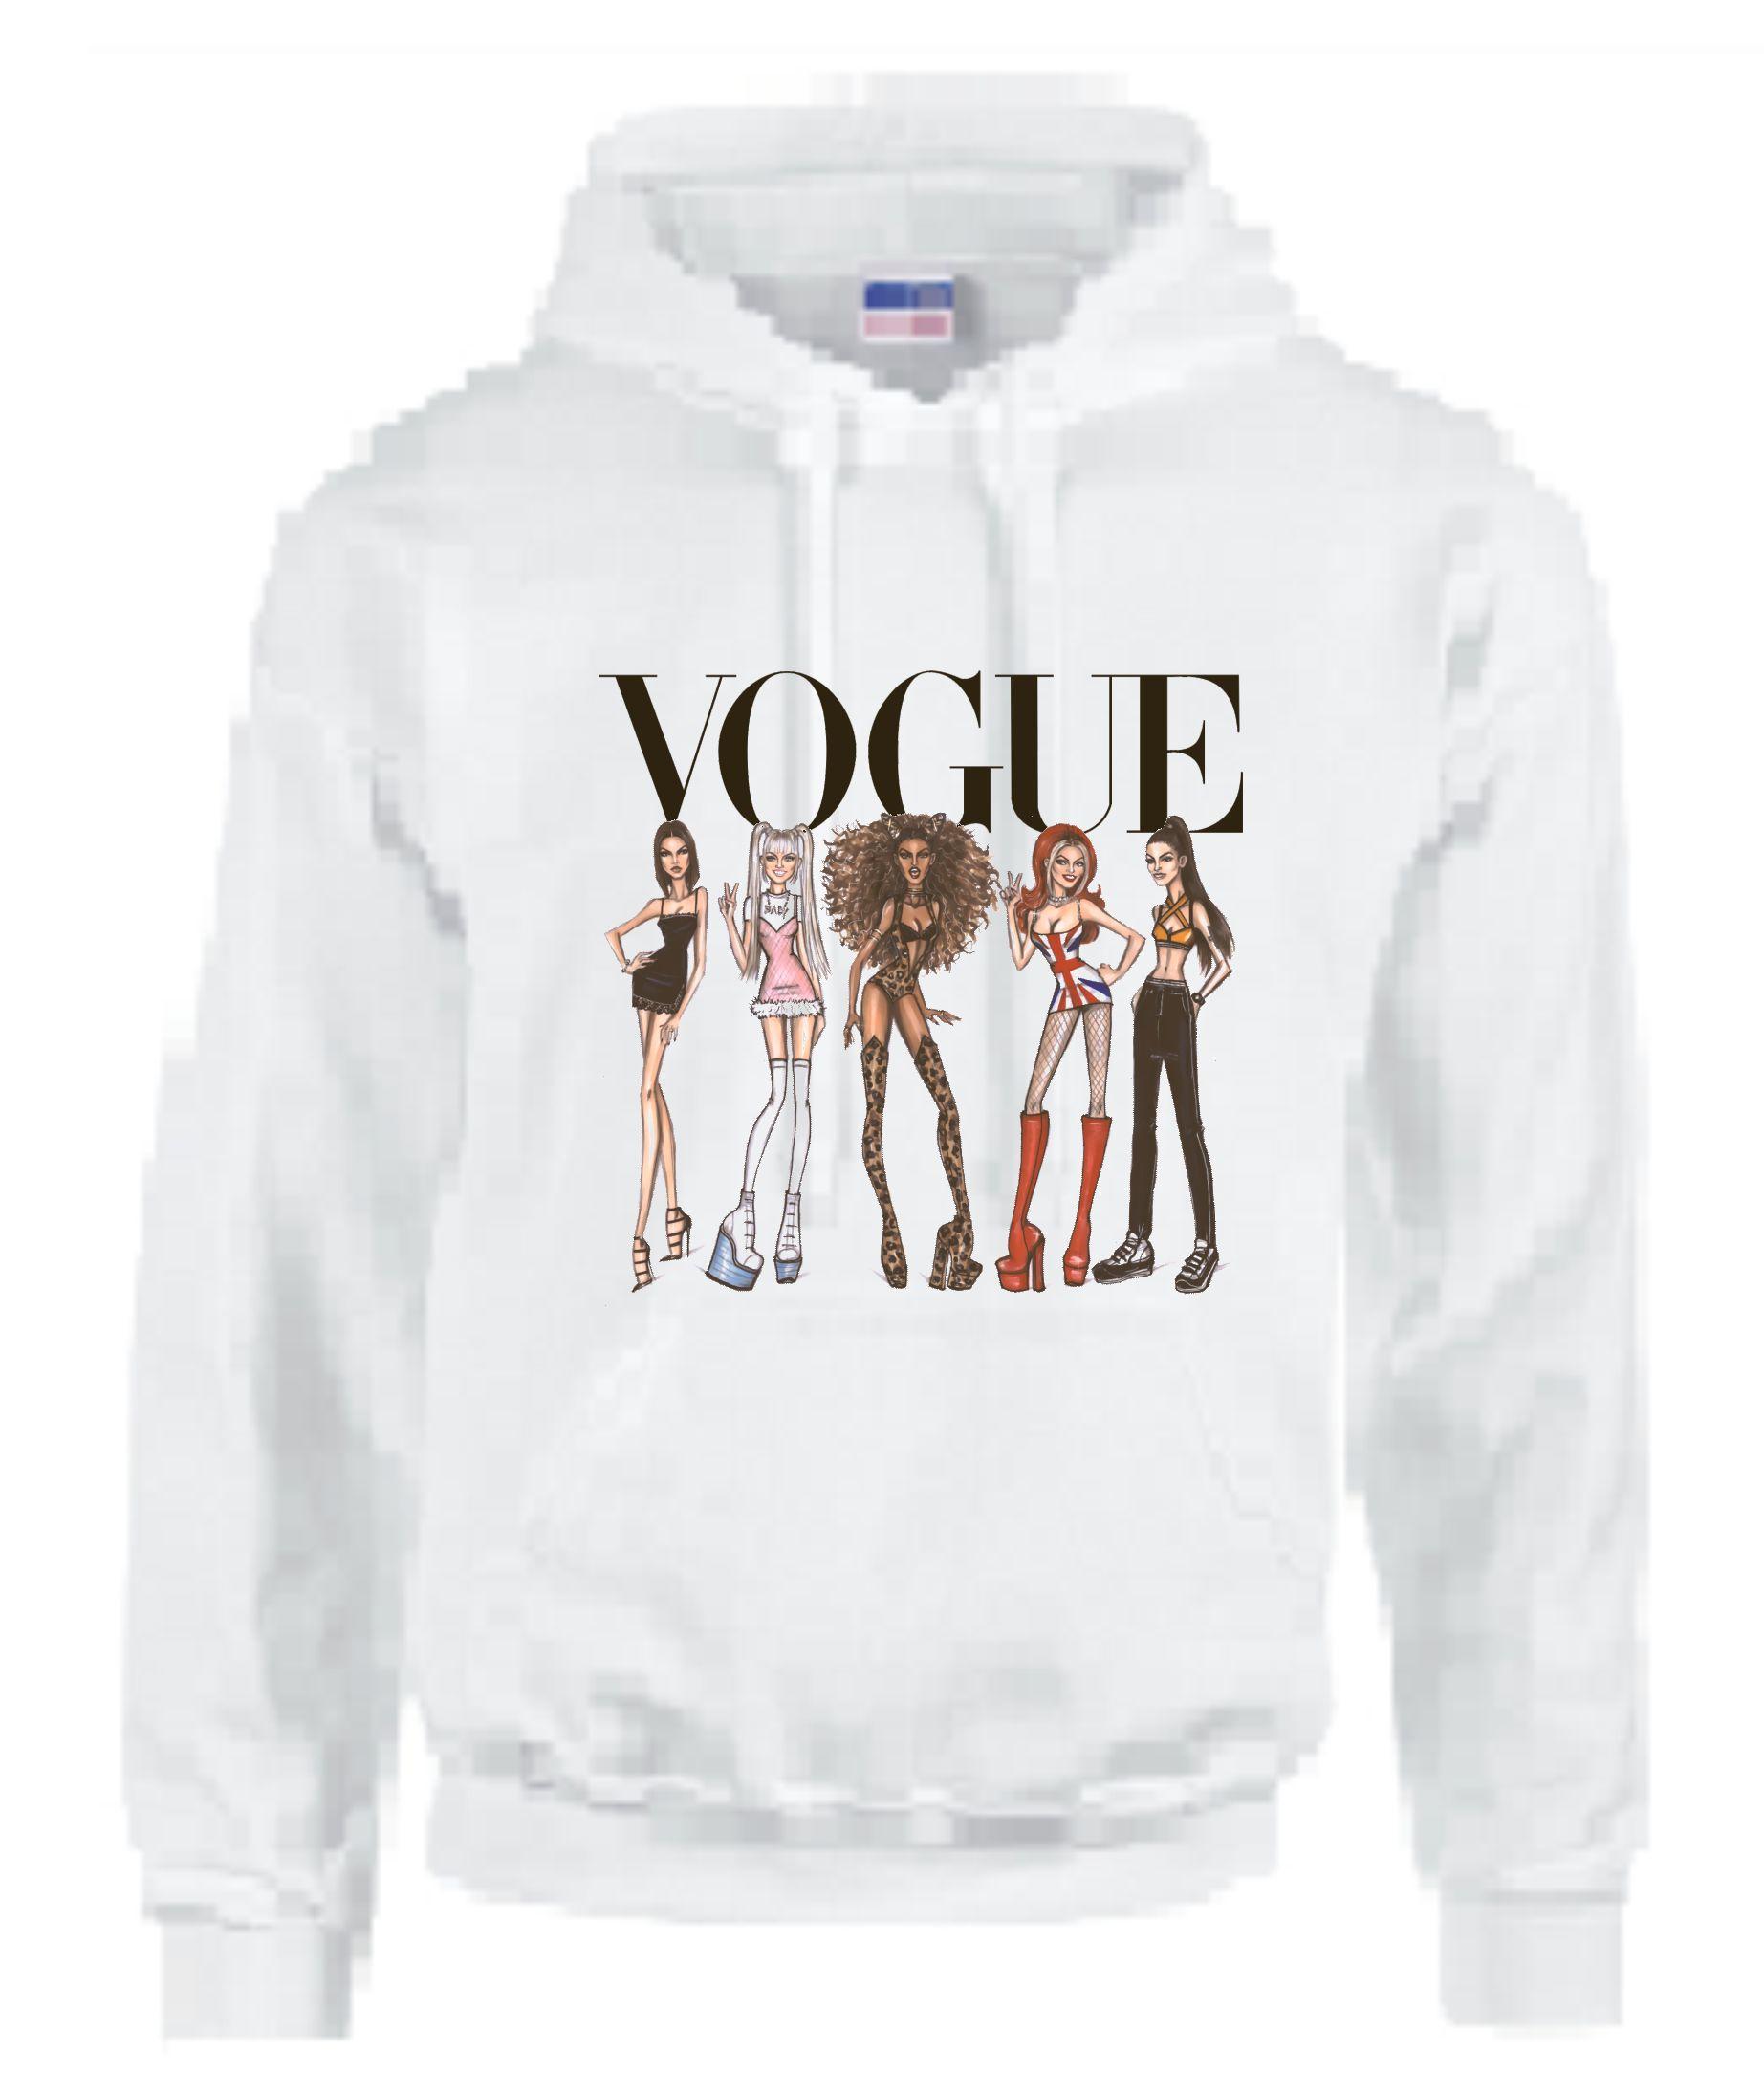 9fac3659e Home · Spice Girls Vogue Adult Unisex Hoodie. Code ADULTHOODIESPRICEGIRLS